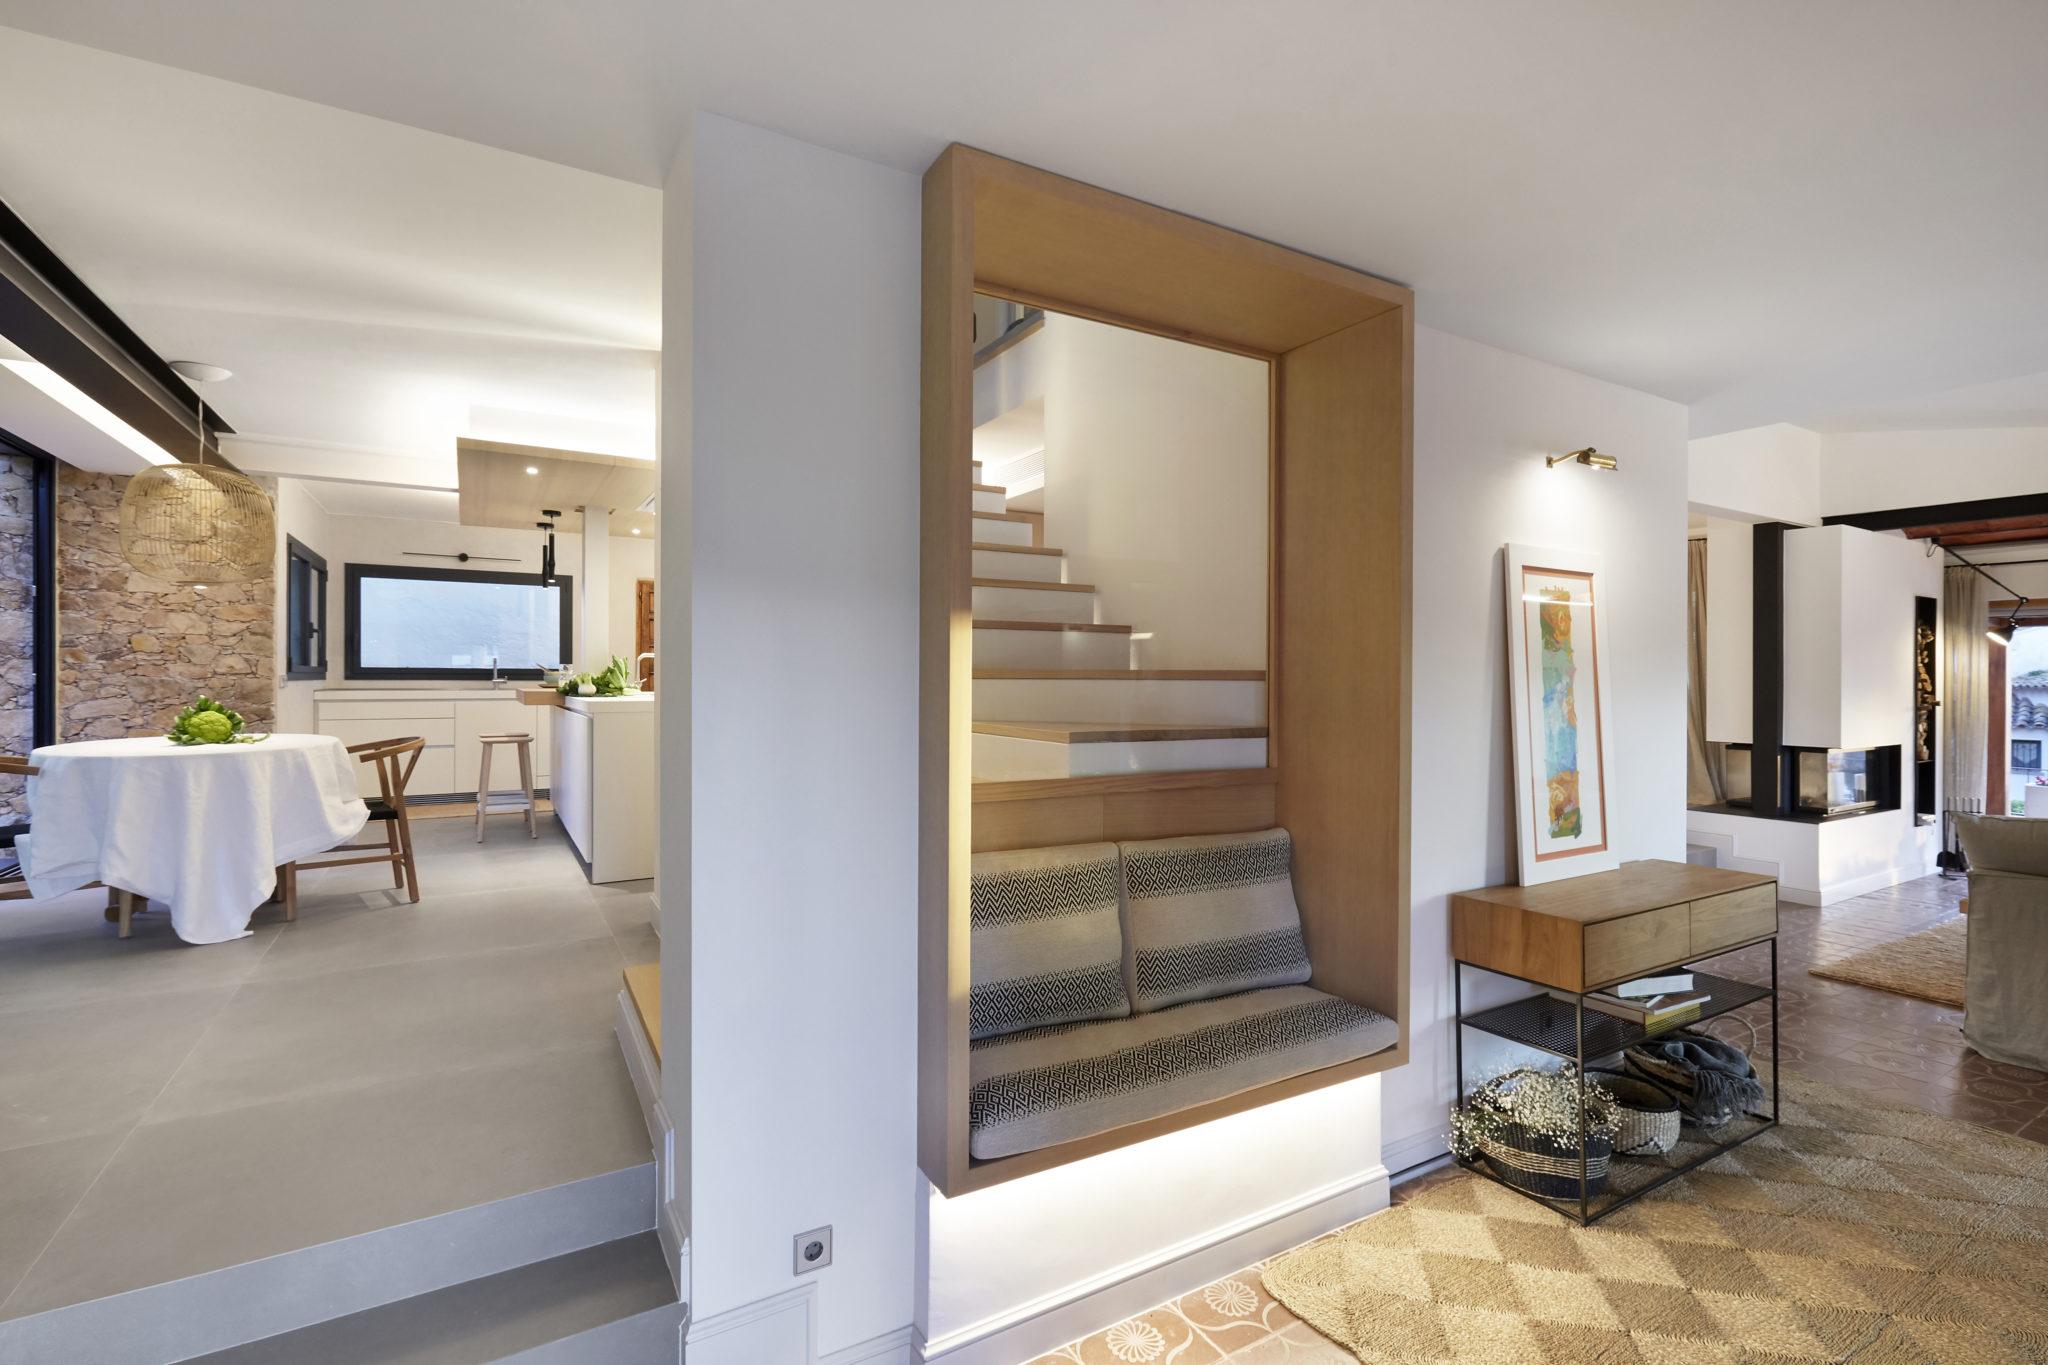 Entrada casa Mediterranea por Rosa Colet Interior Design